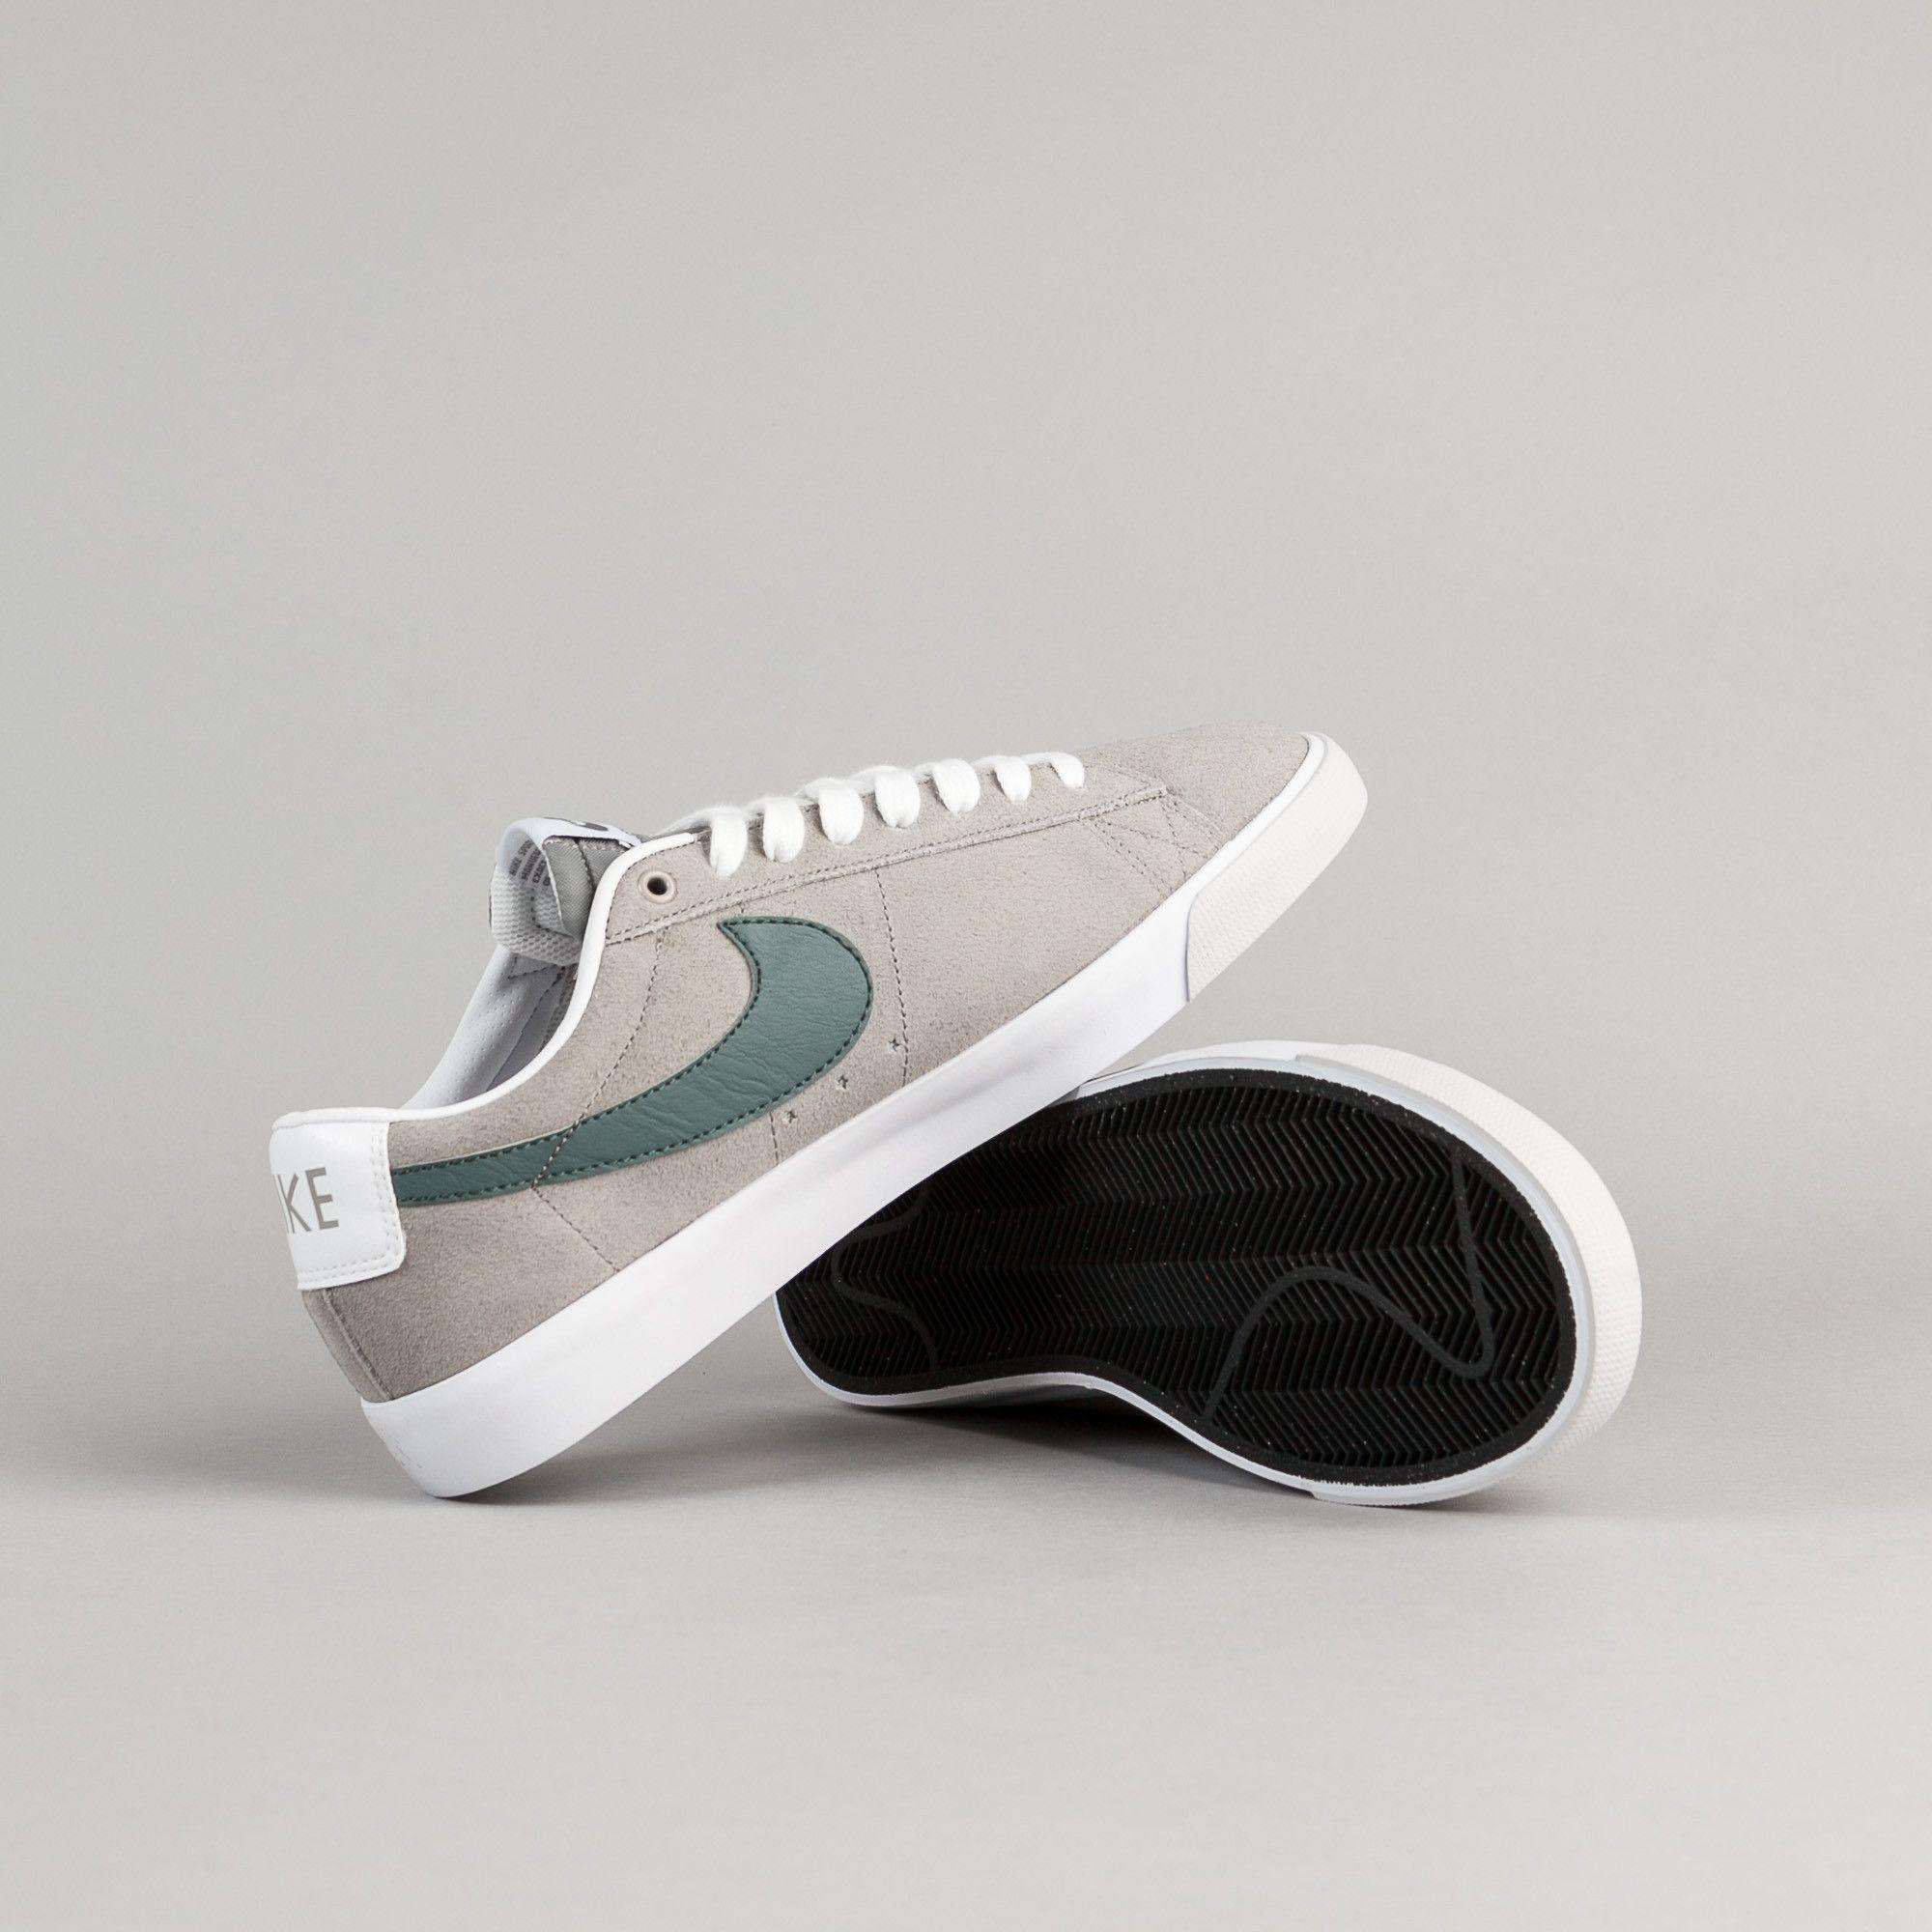 Nike SB Blazer Low GT Shoes - Dust / Hasta - White - Pure Platinum